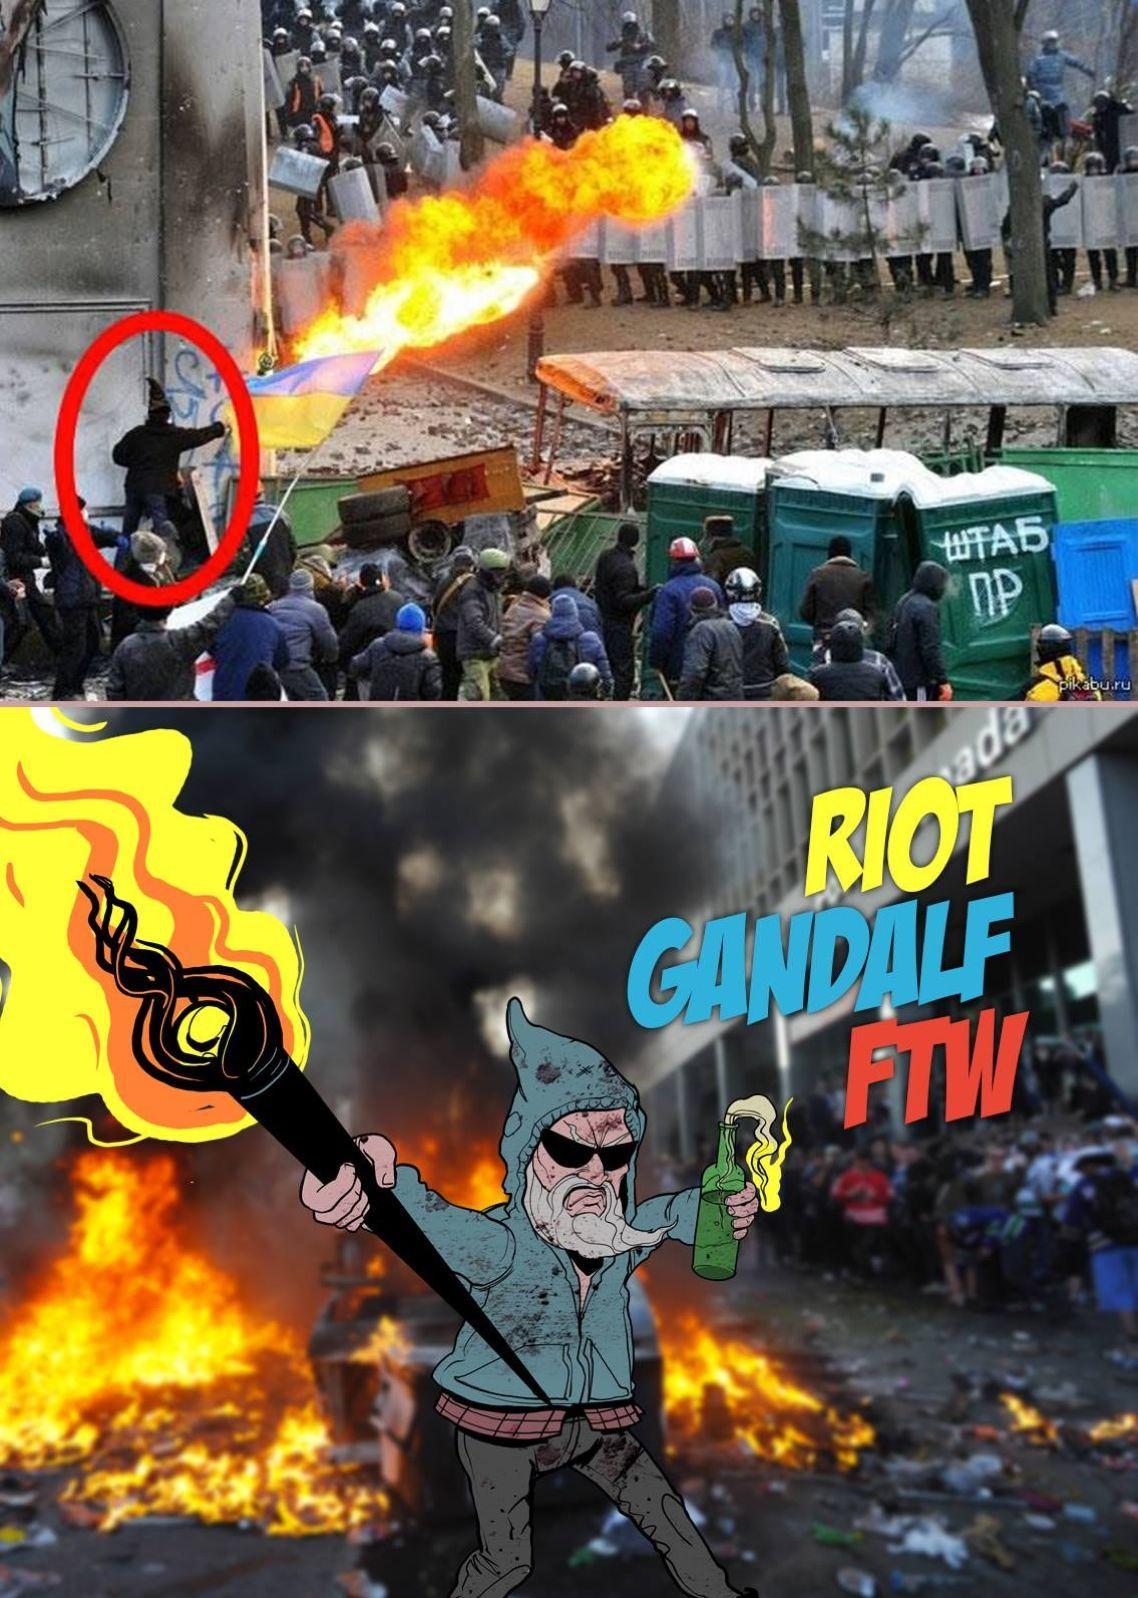 Riot Gandalf is the best Gandalf - meme